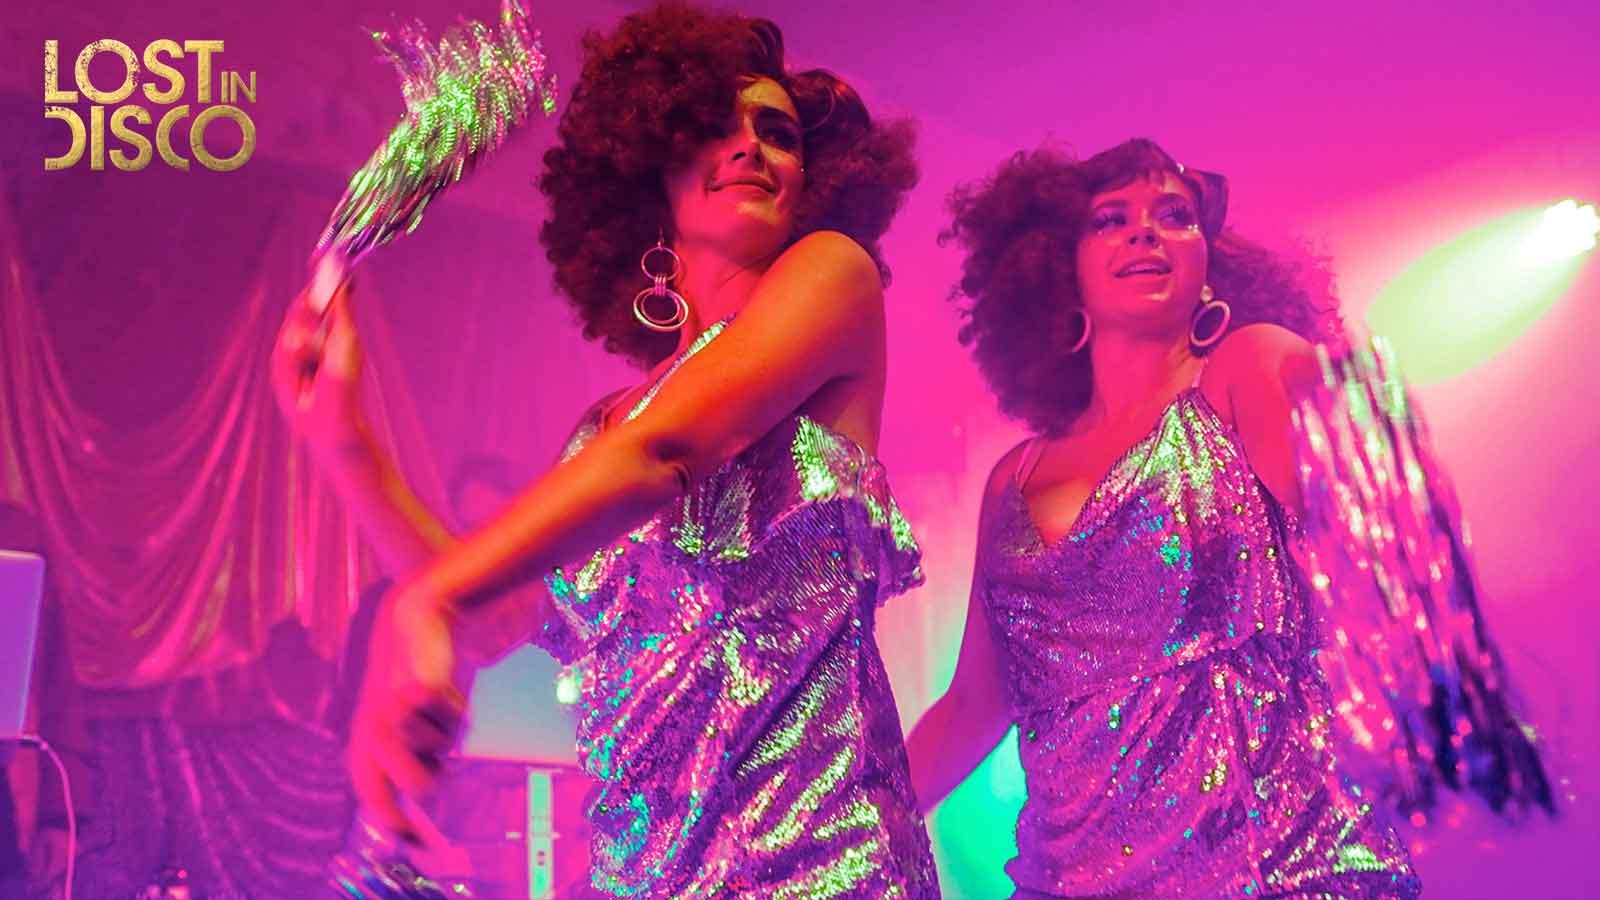 Lost In Disco at Bush Hall DJ Jason Regan classic disco 70s disco funk soul night